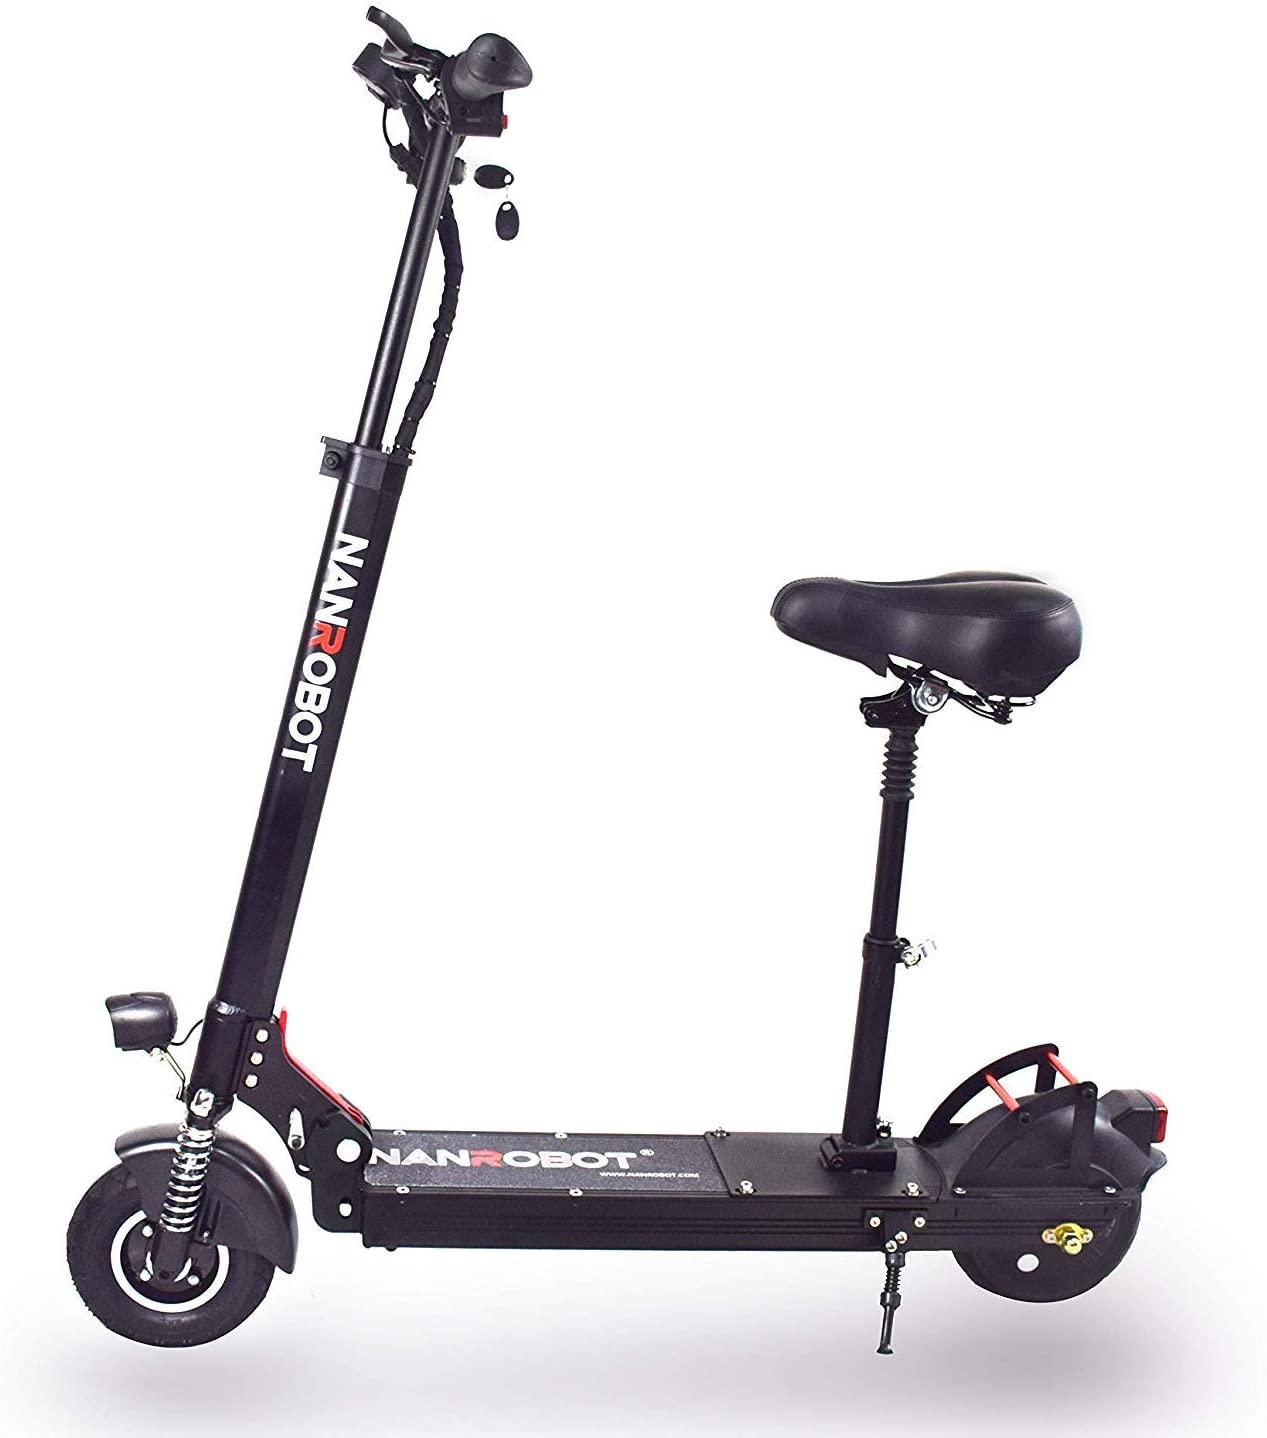 NANROBOT X4 2.0 Light Folding Adult Electric Scooter, 500W Motor, Maximum Speed 20MPH, Durable Range 25 Miles,Net Weight 33 pounds